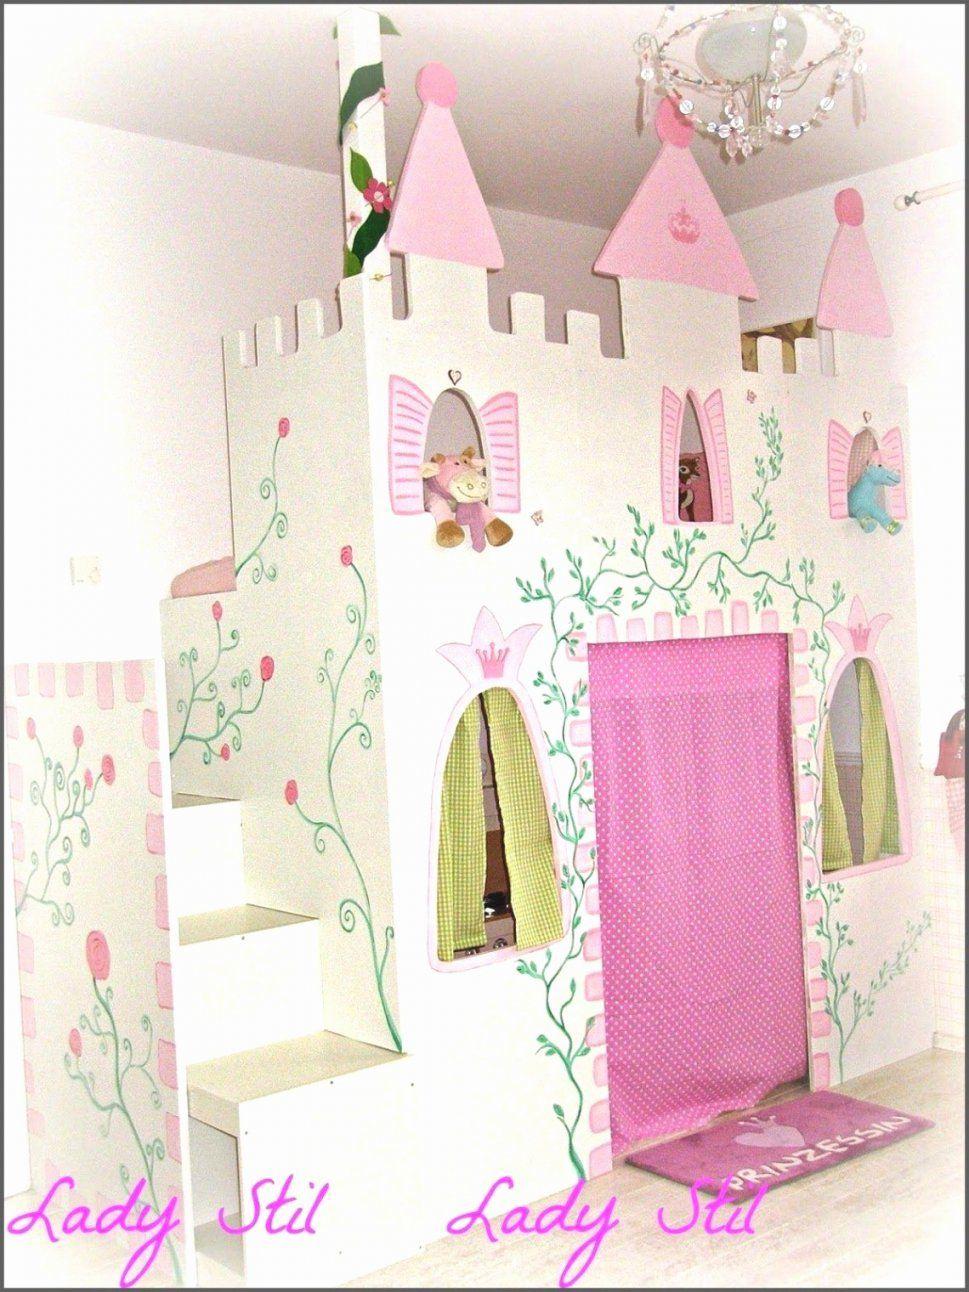 Kinderbett Selber Bauen Prinzessin Neu Ausgezeichnet Betthimmel von Betthimmel Kinderbett Selber Machen Bild